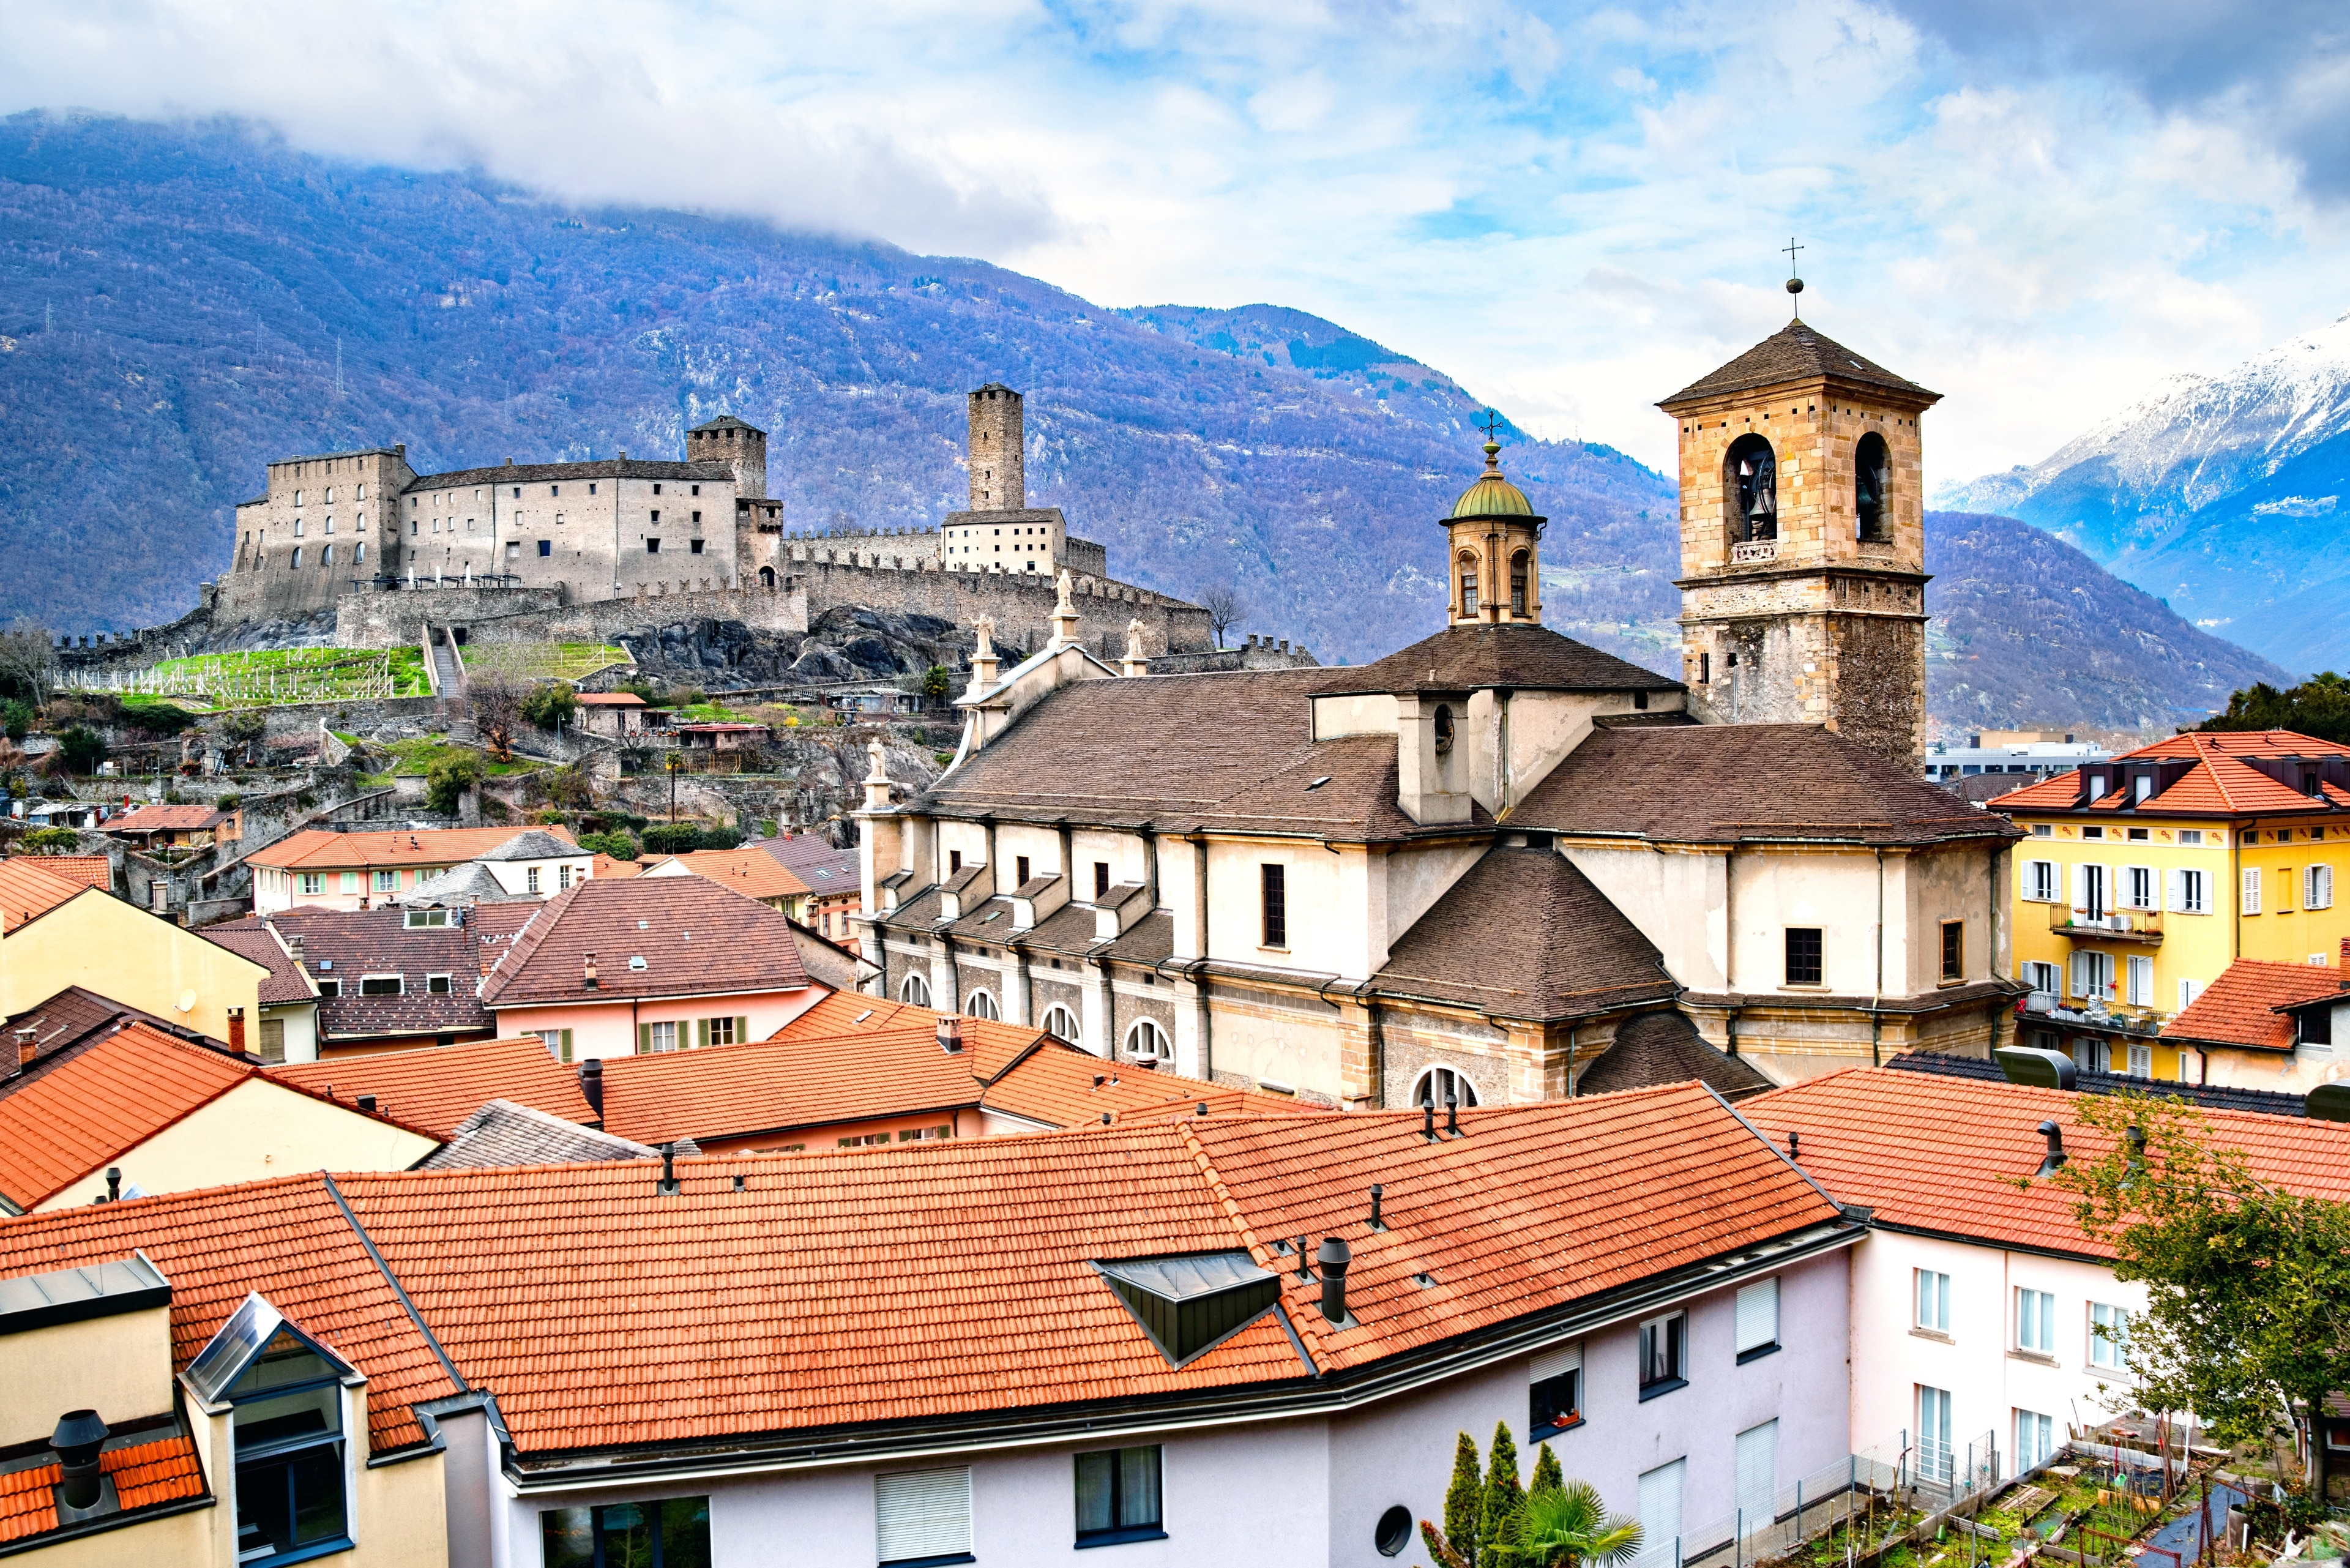 Bellinzona, Canton of Ticino, Switzerland